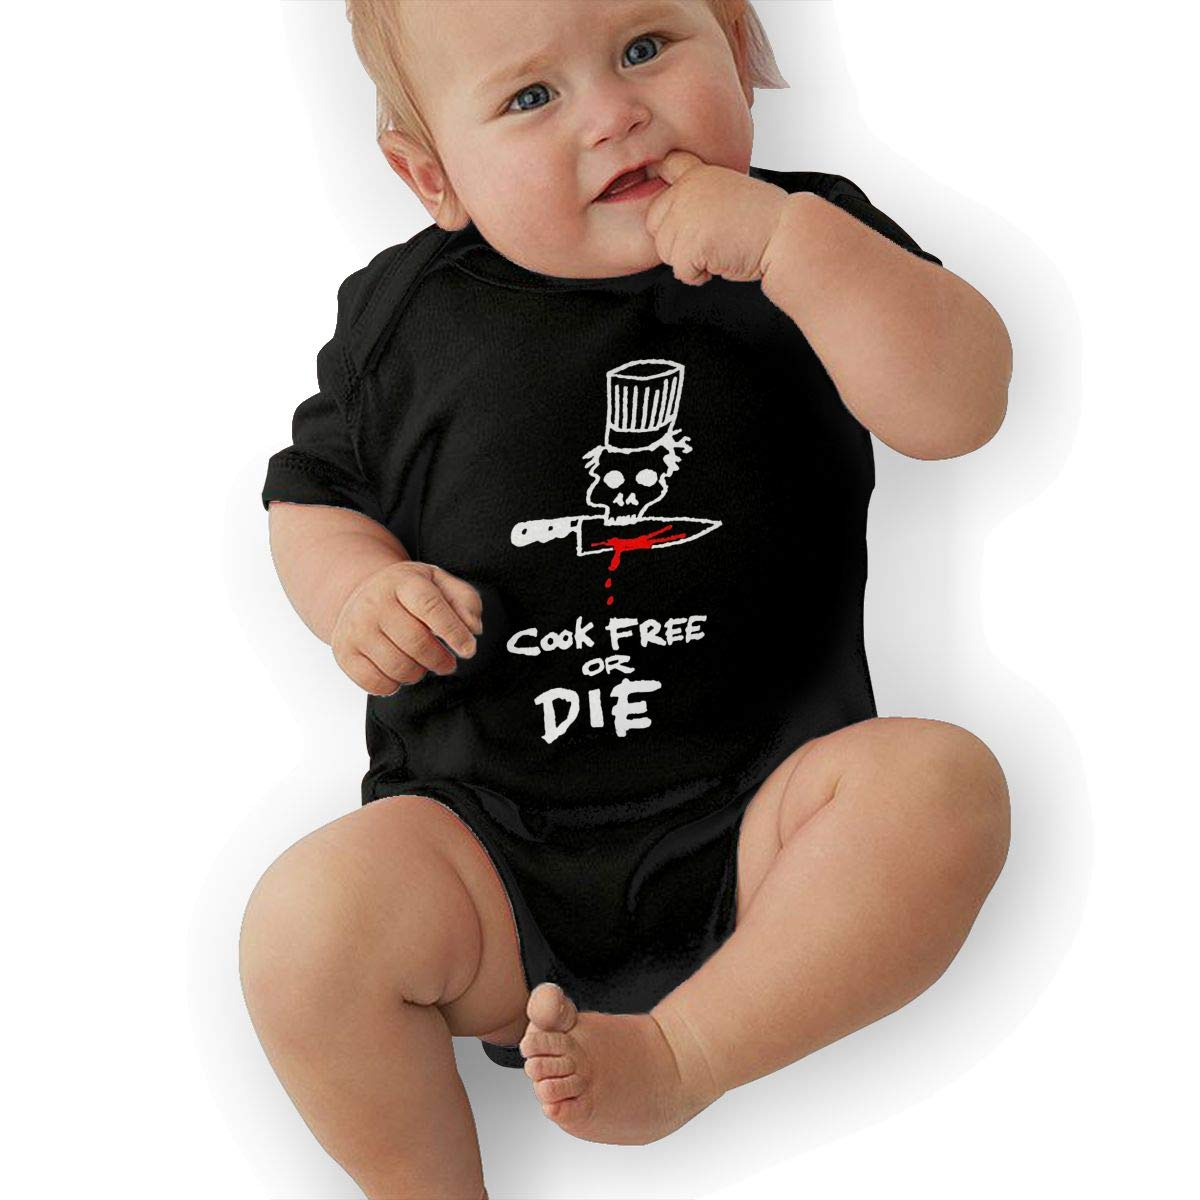 Anthony Bourdain Infant Toddler Baby Boy Girl Romper Summer Jumpsuit Short Sleeve Clothing Set